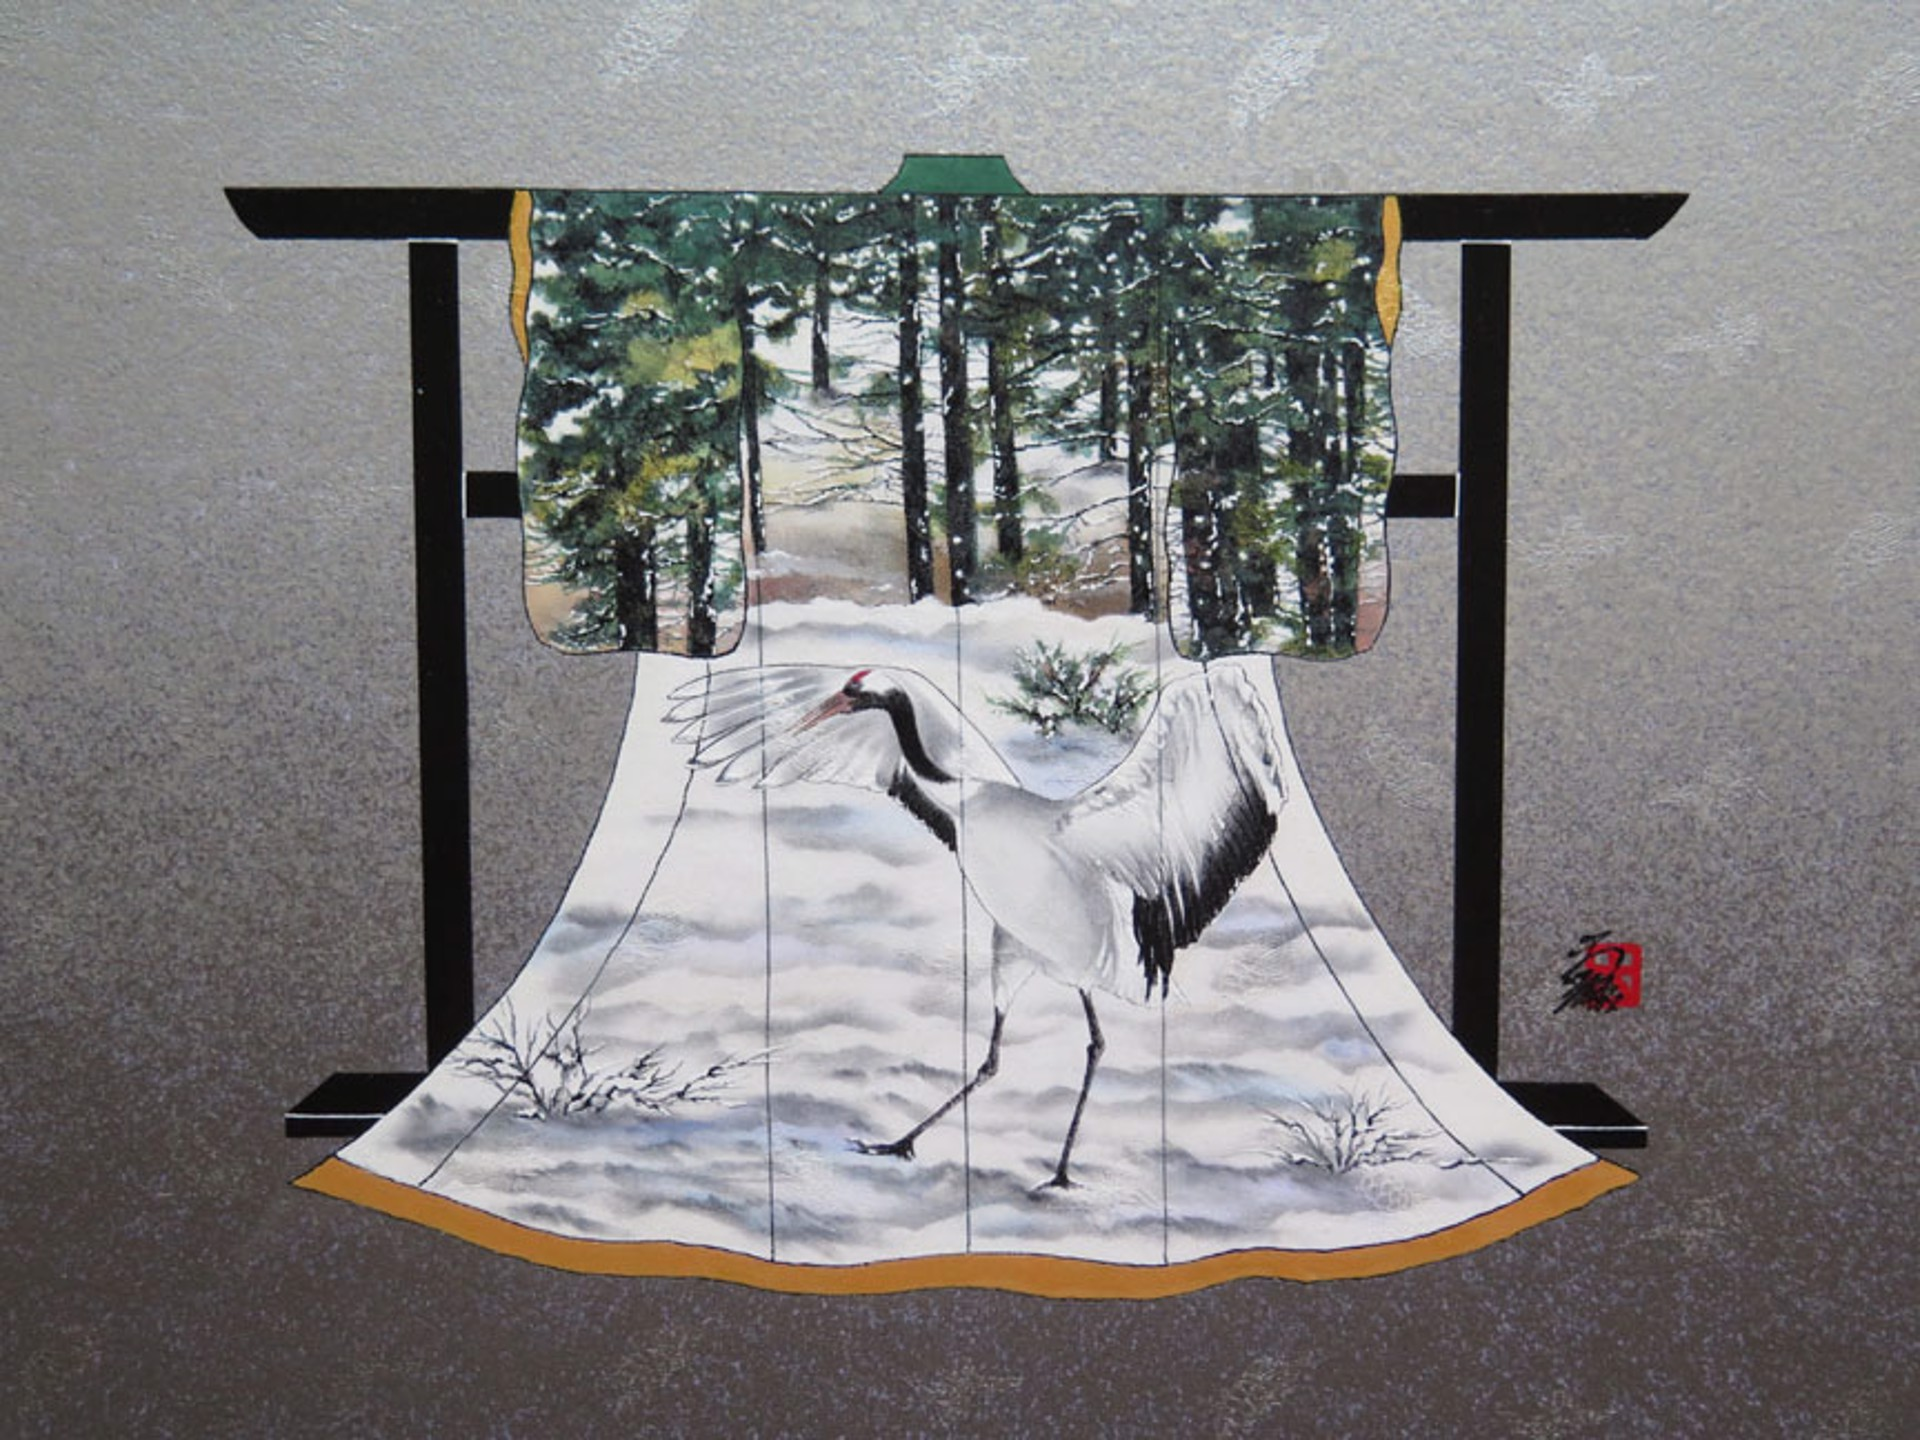 Dancing Crane 7 Tancyouzuru by Hisashi Otsuka